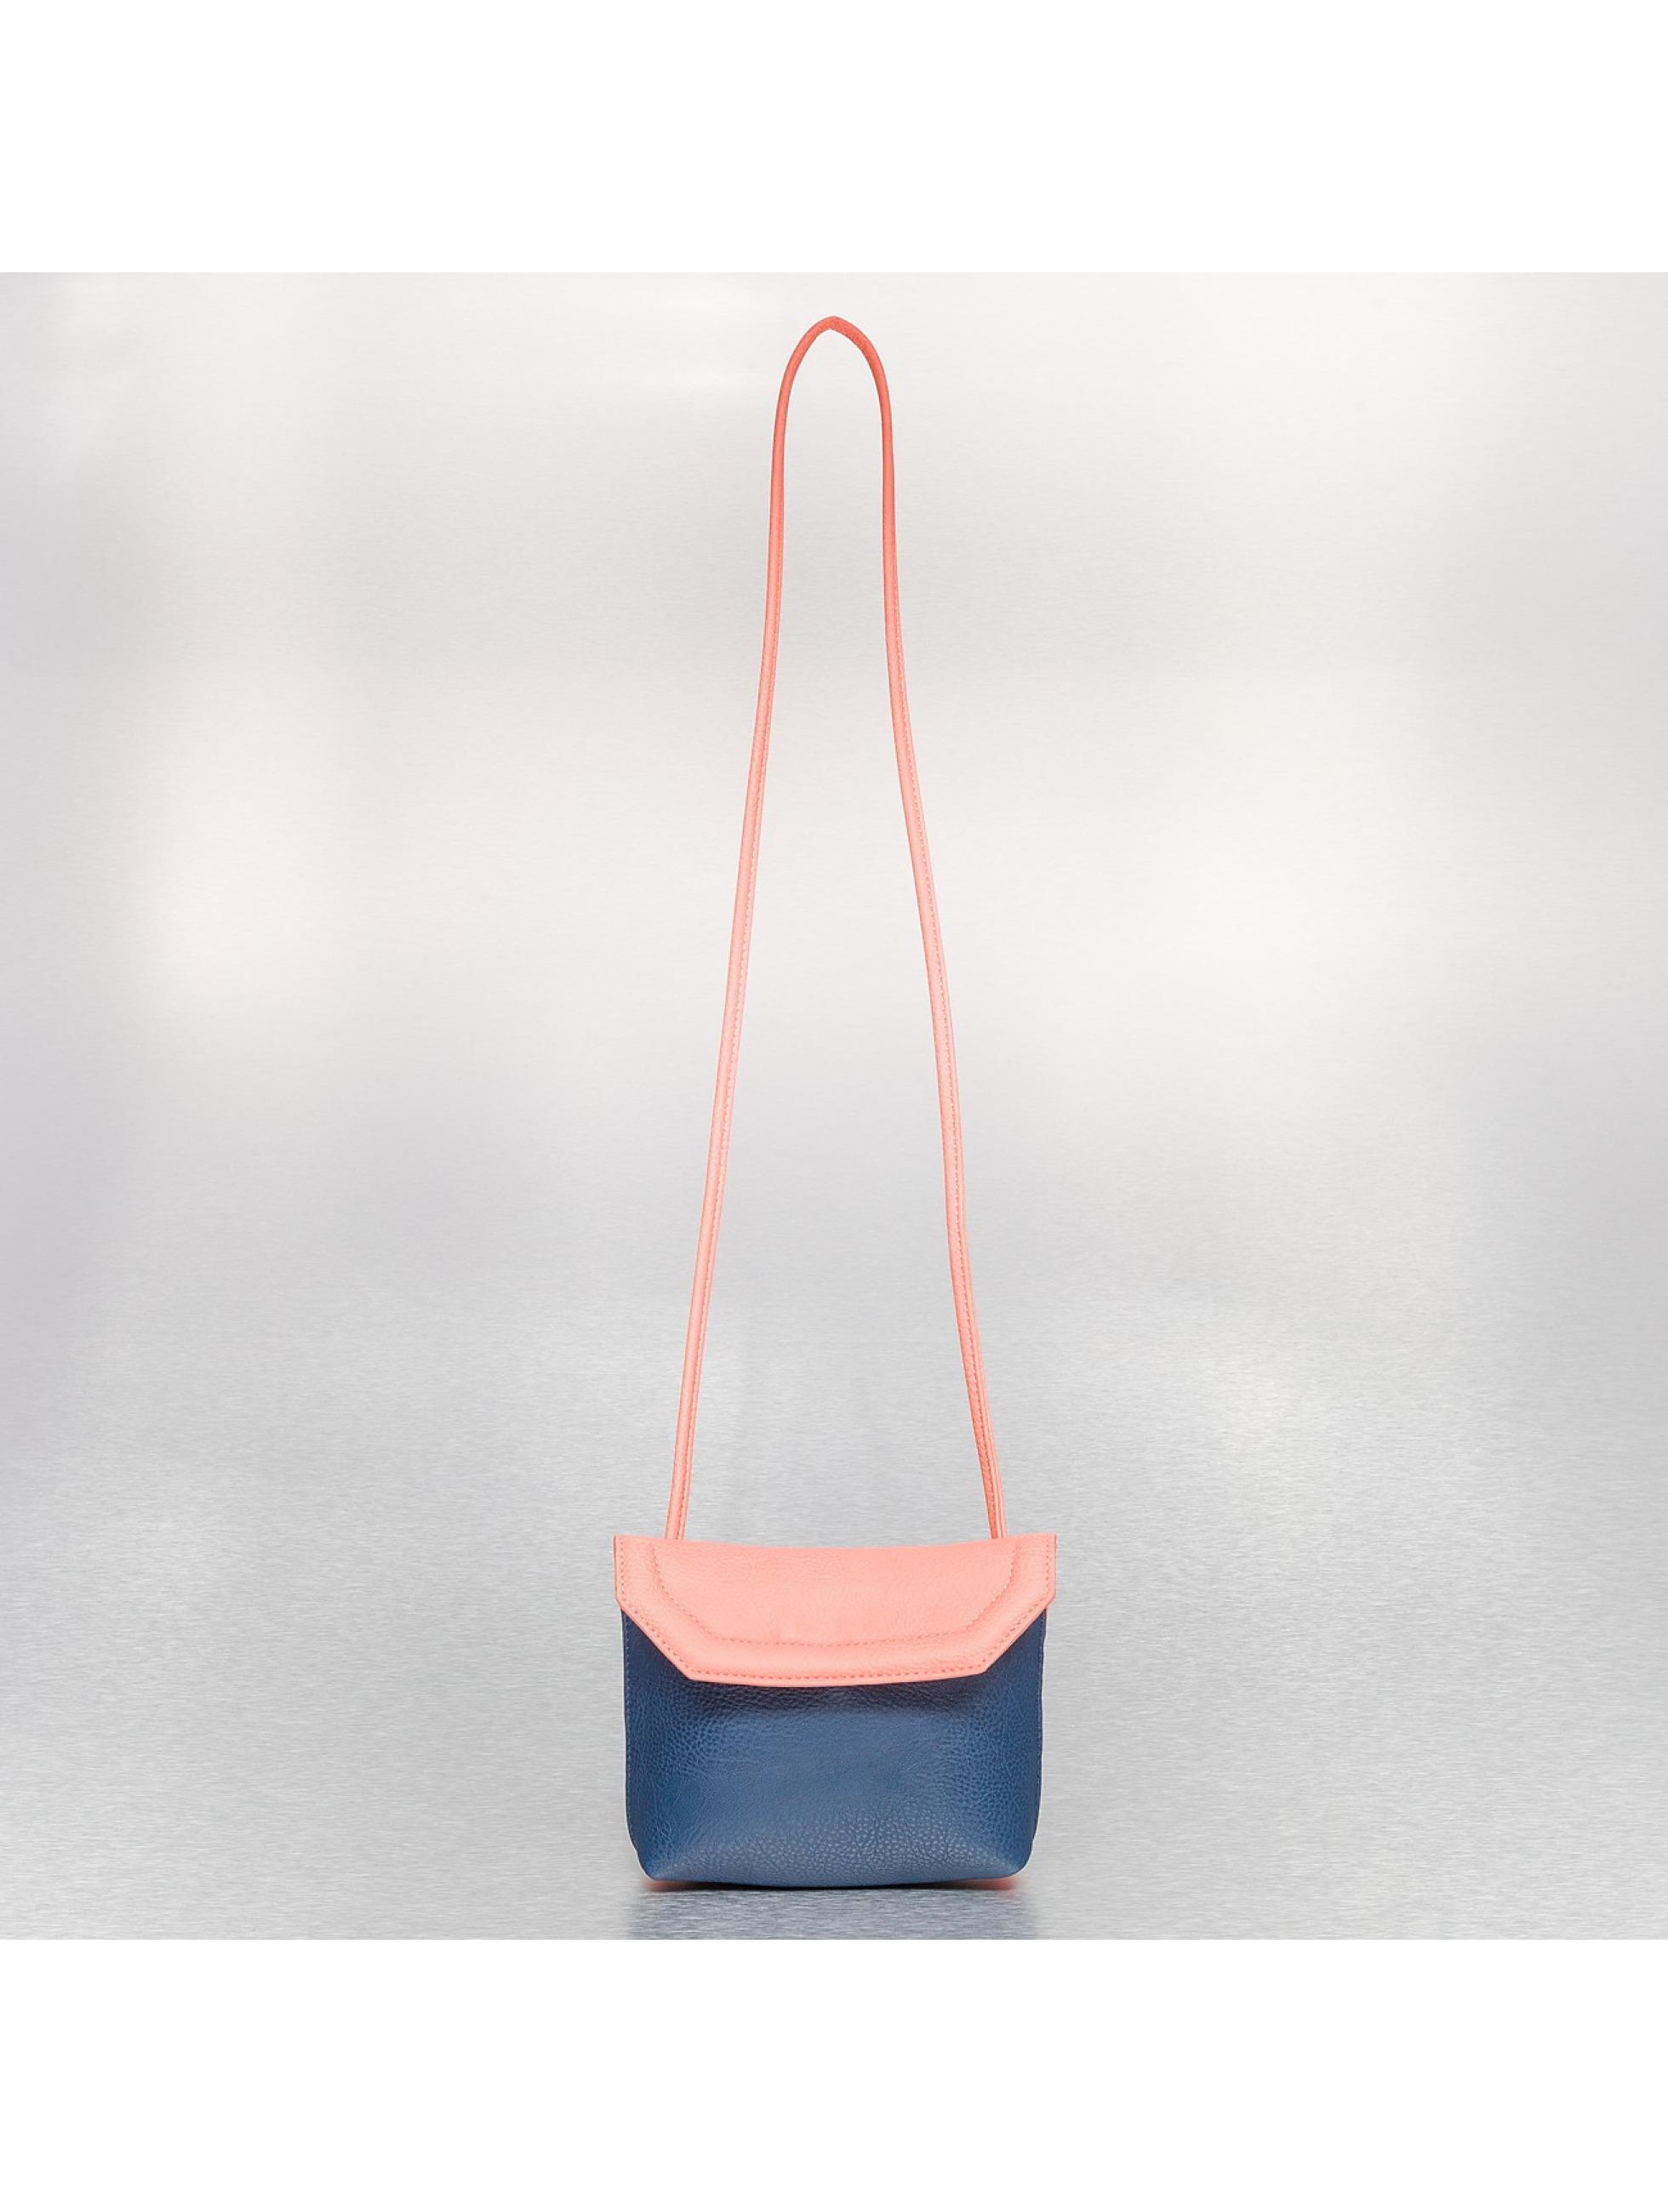 Tasche Jada Crossove in blau